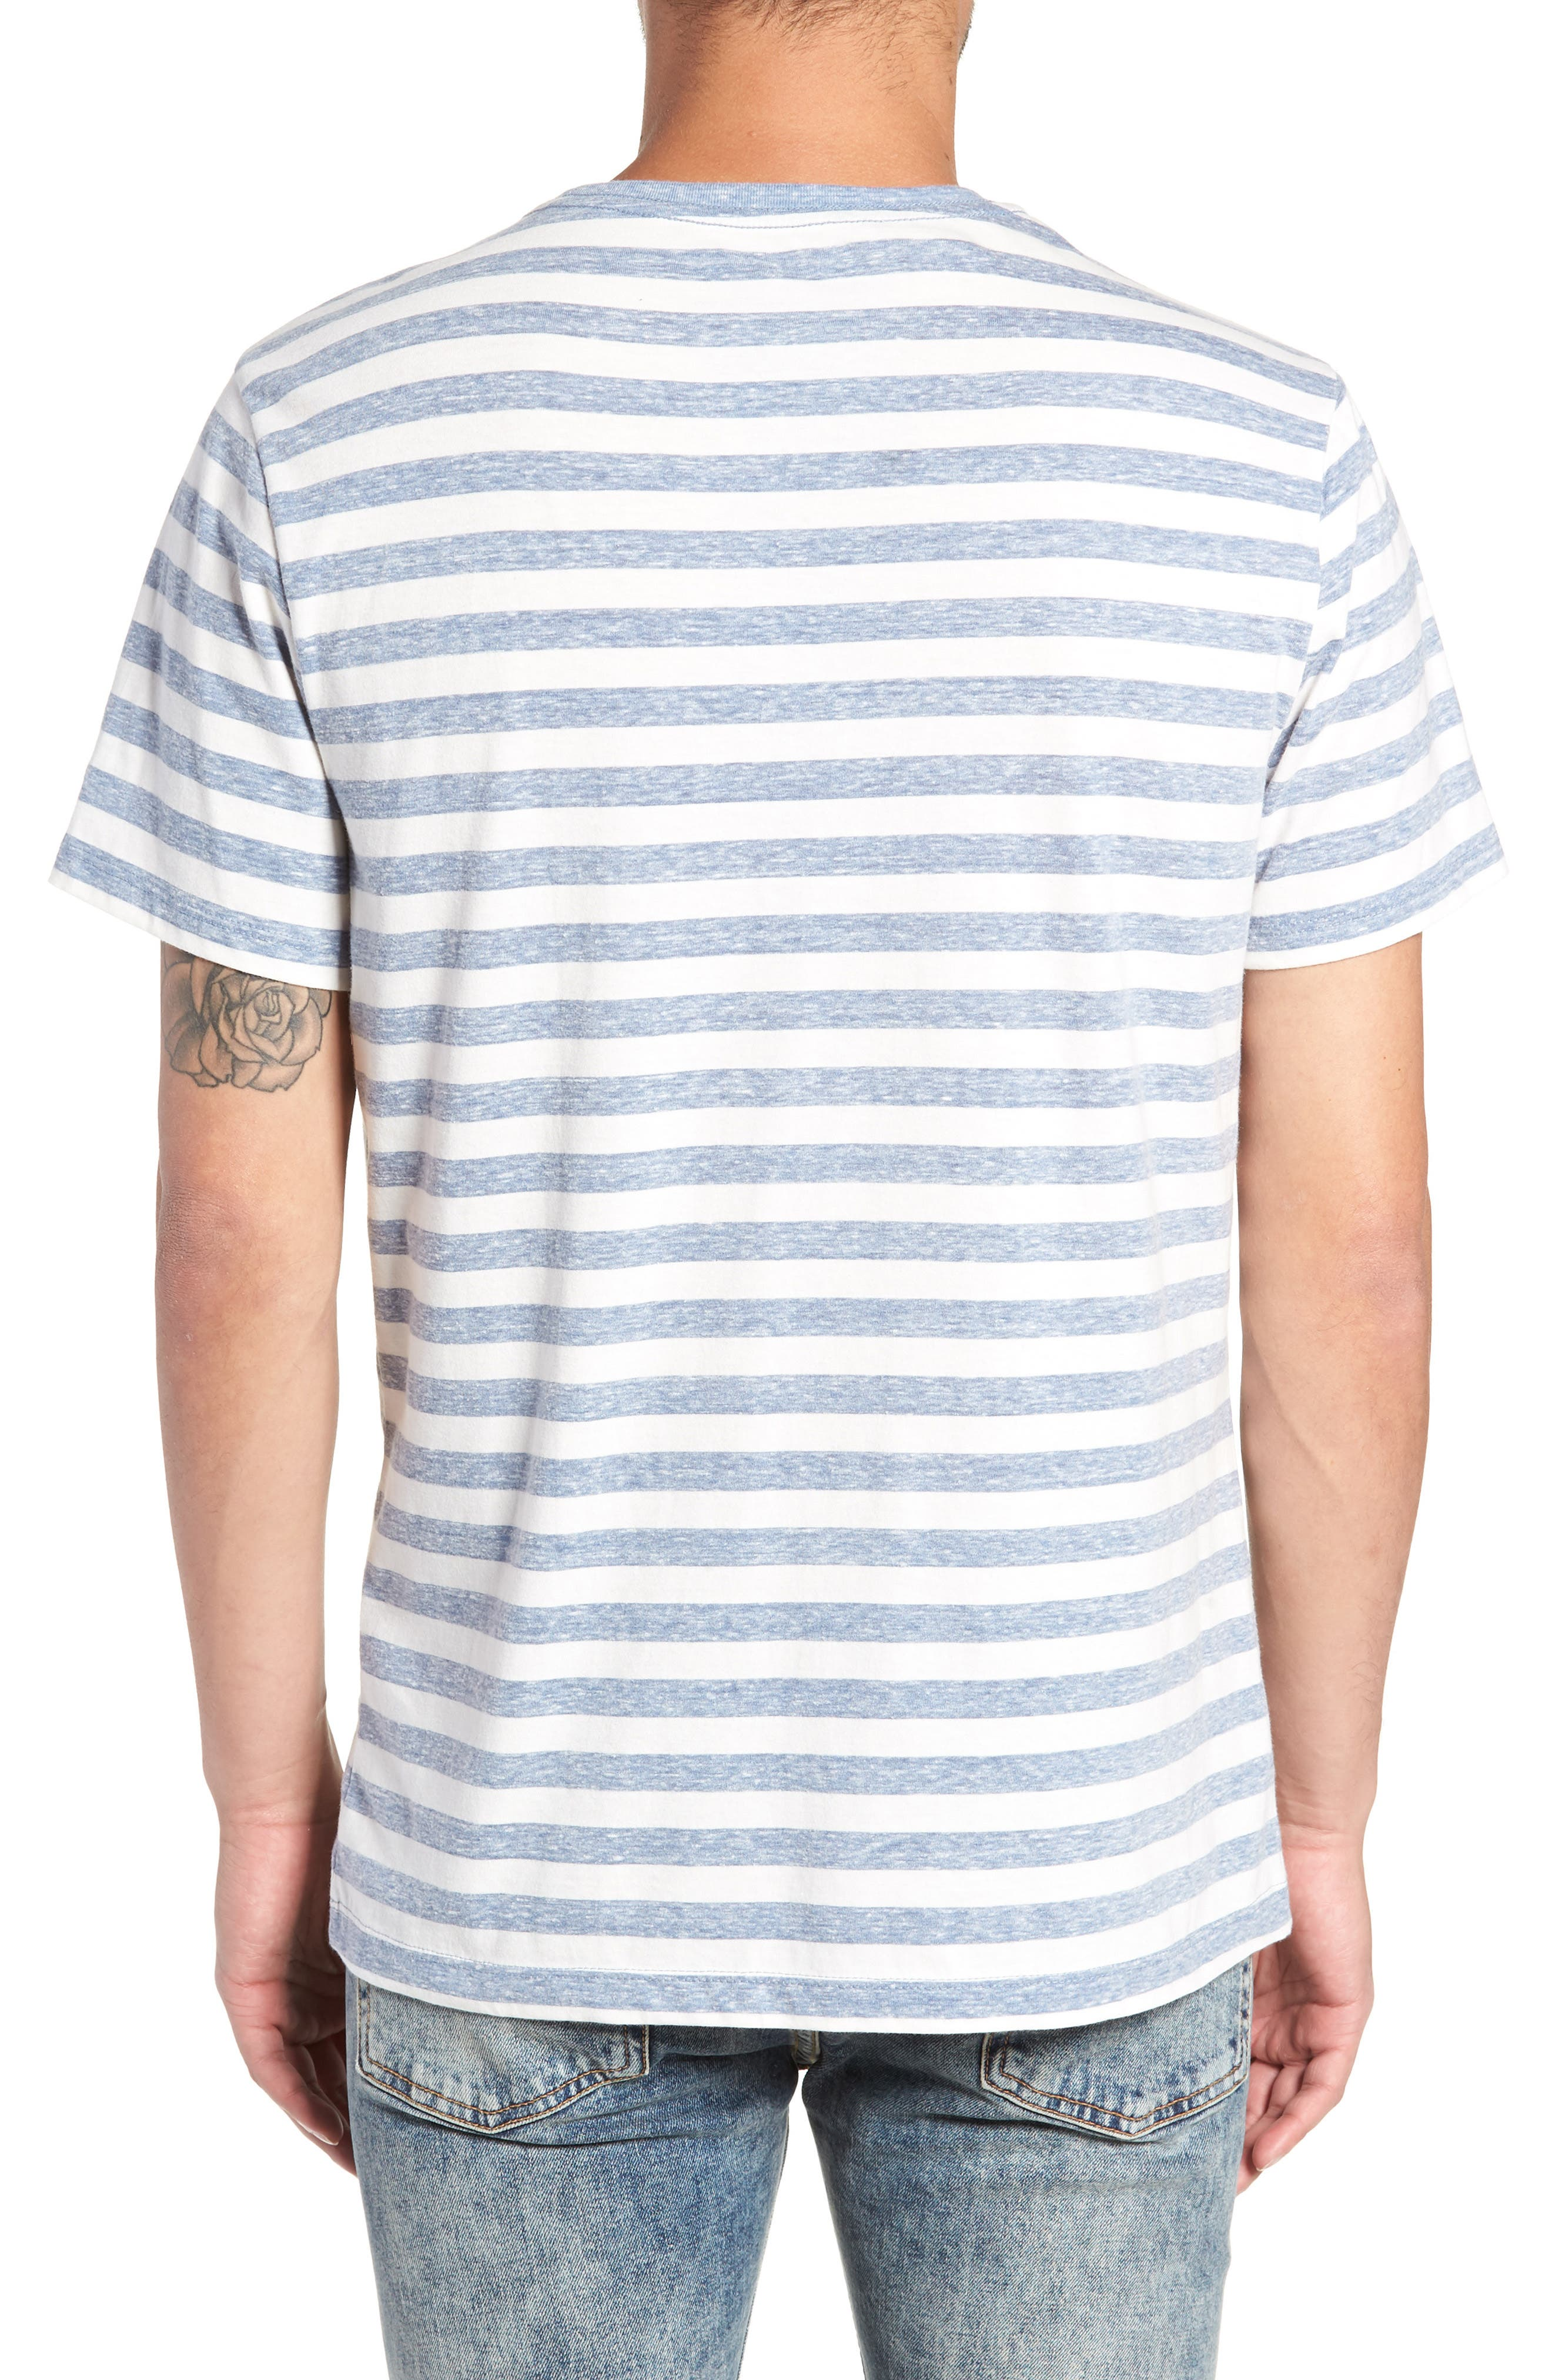 Stripe Crewneck T-Shirt,                             Alternate thumbnail 2, color,                             BLUE CHAMBRAY- WHITE STRIPE